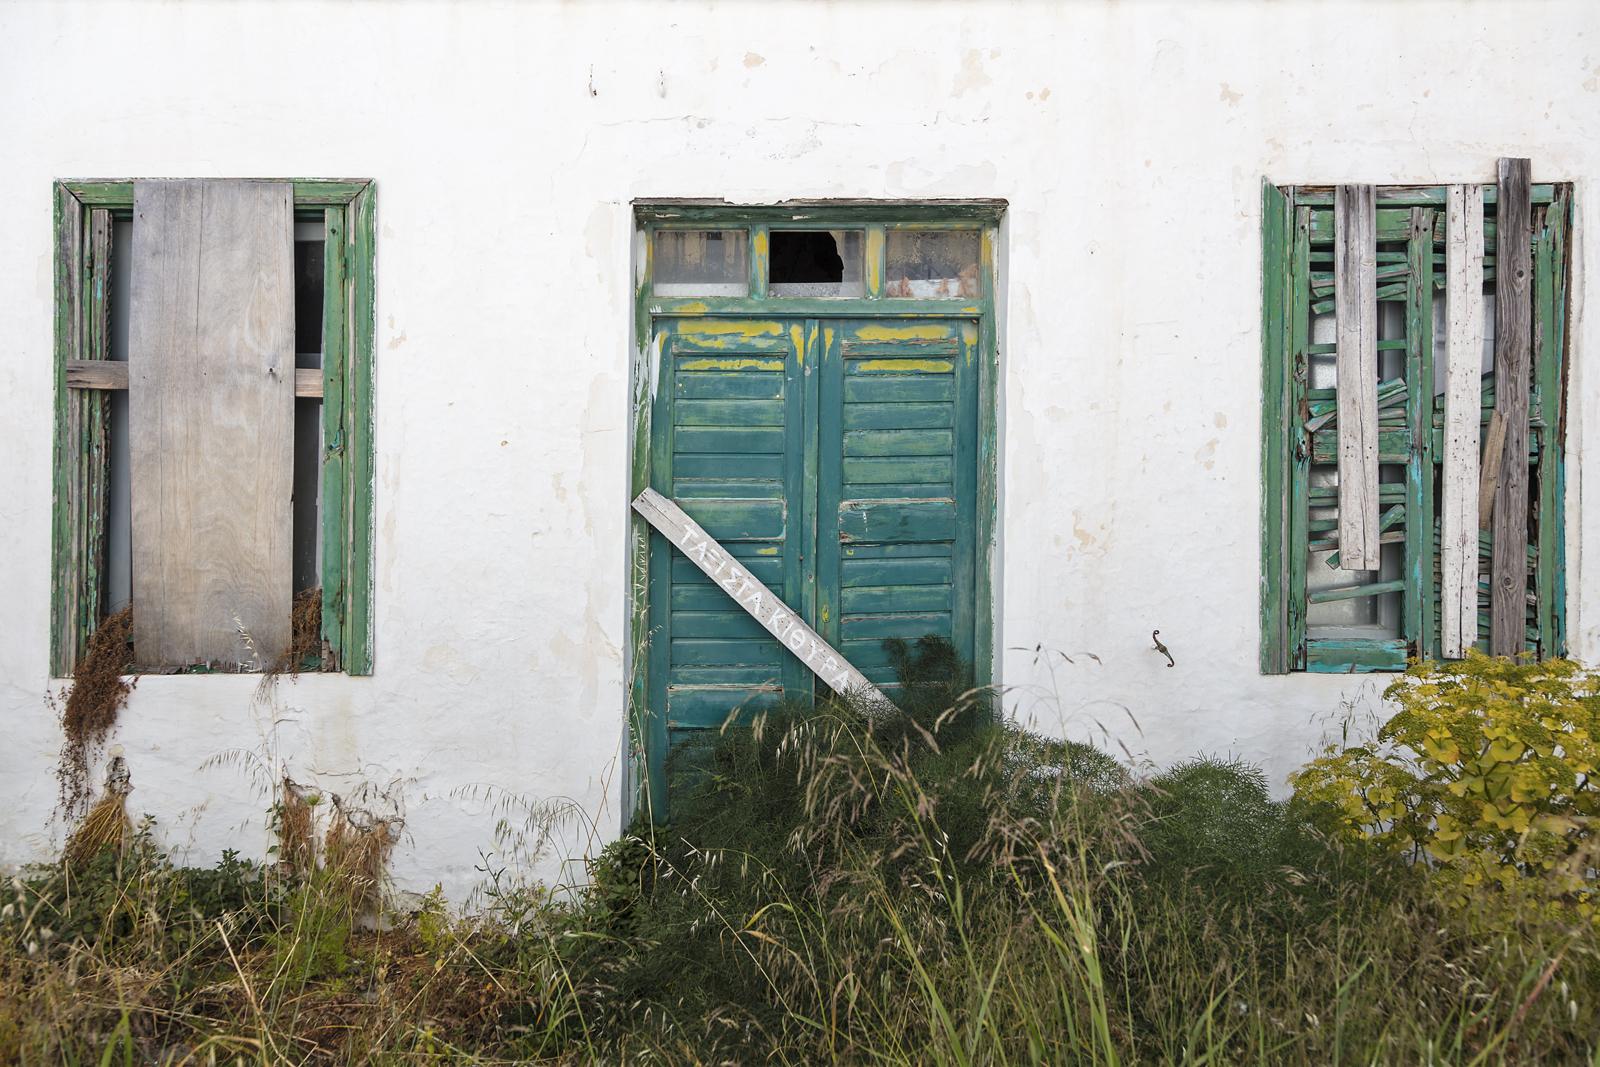 Fond d 39 cran fen tre mur bois maison vert bleu for Agrandissement maison zone verte